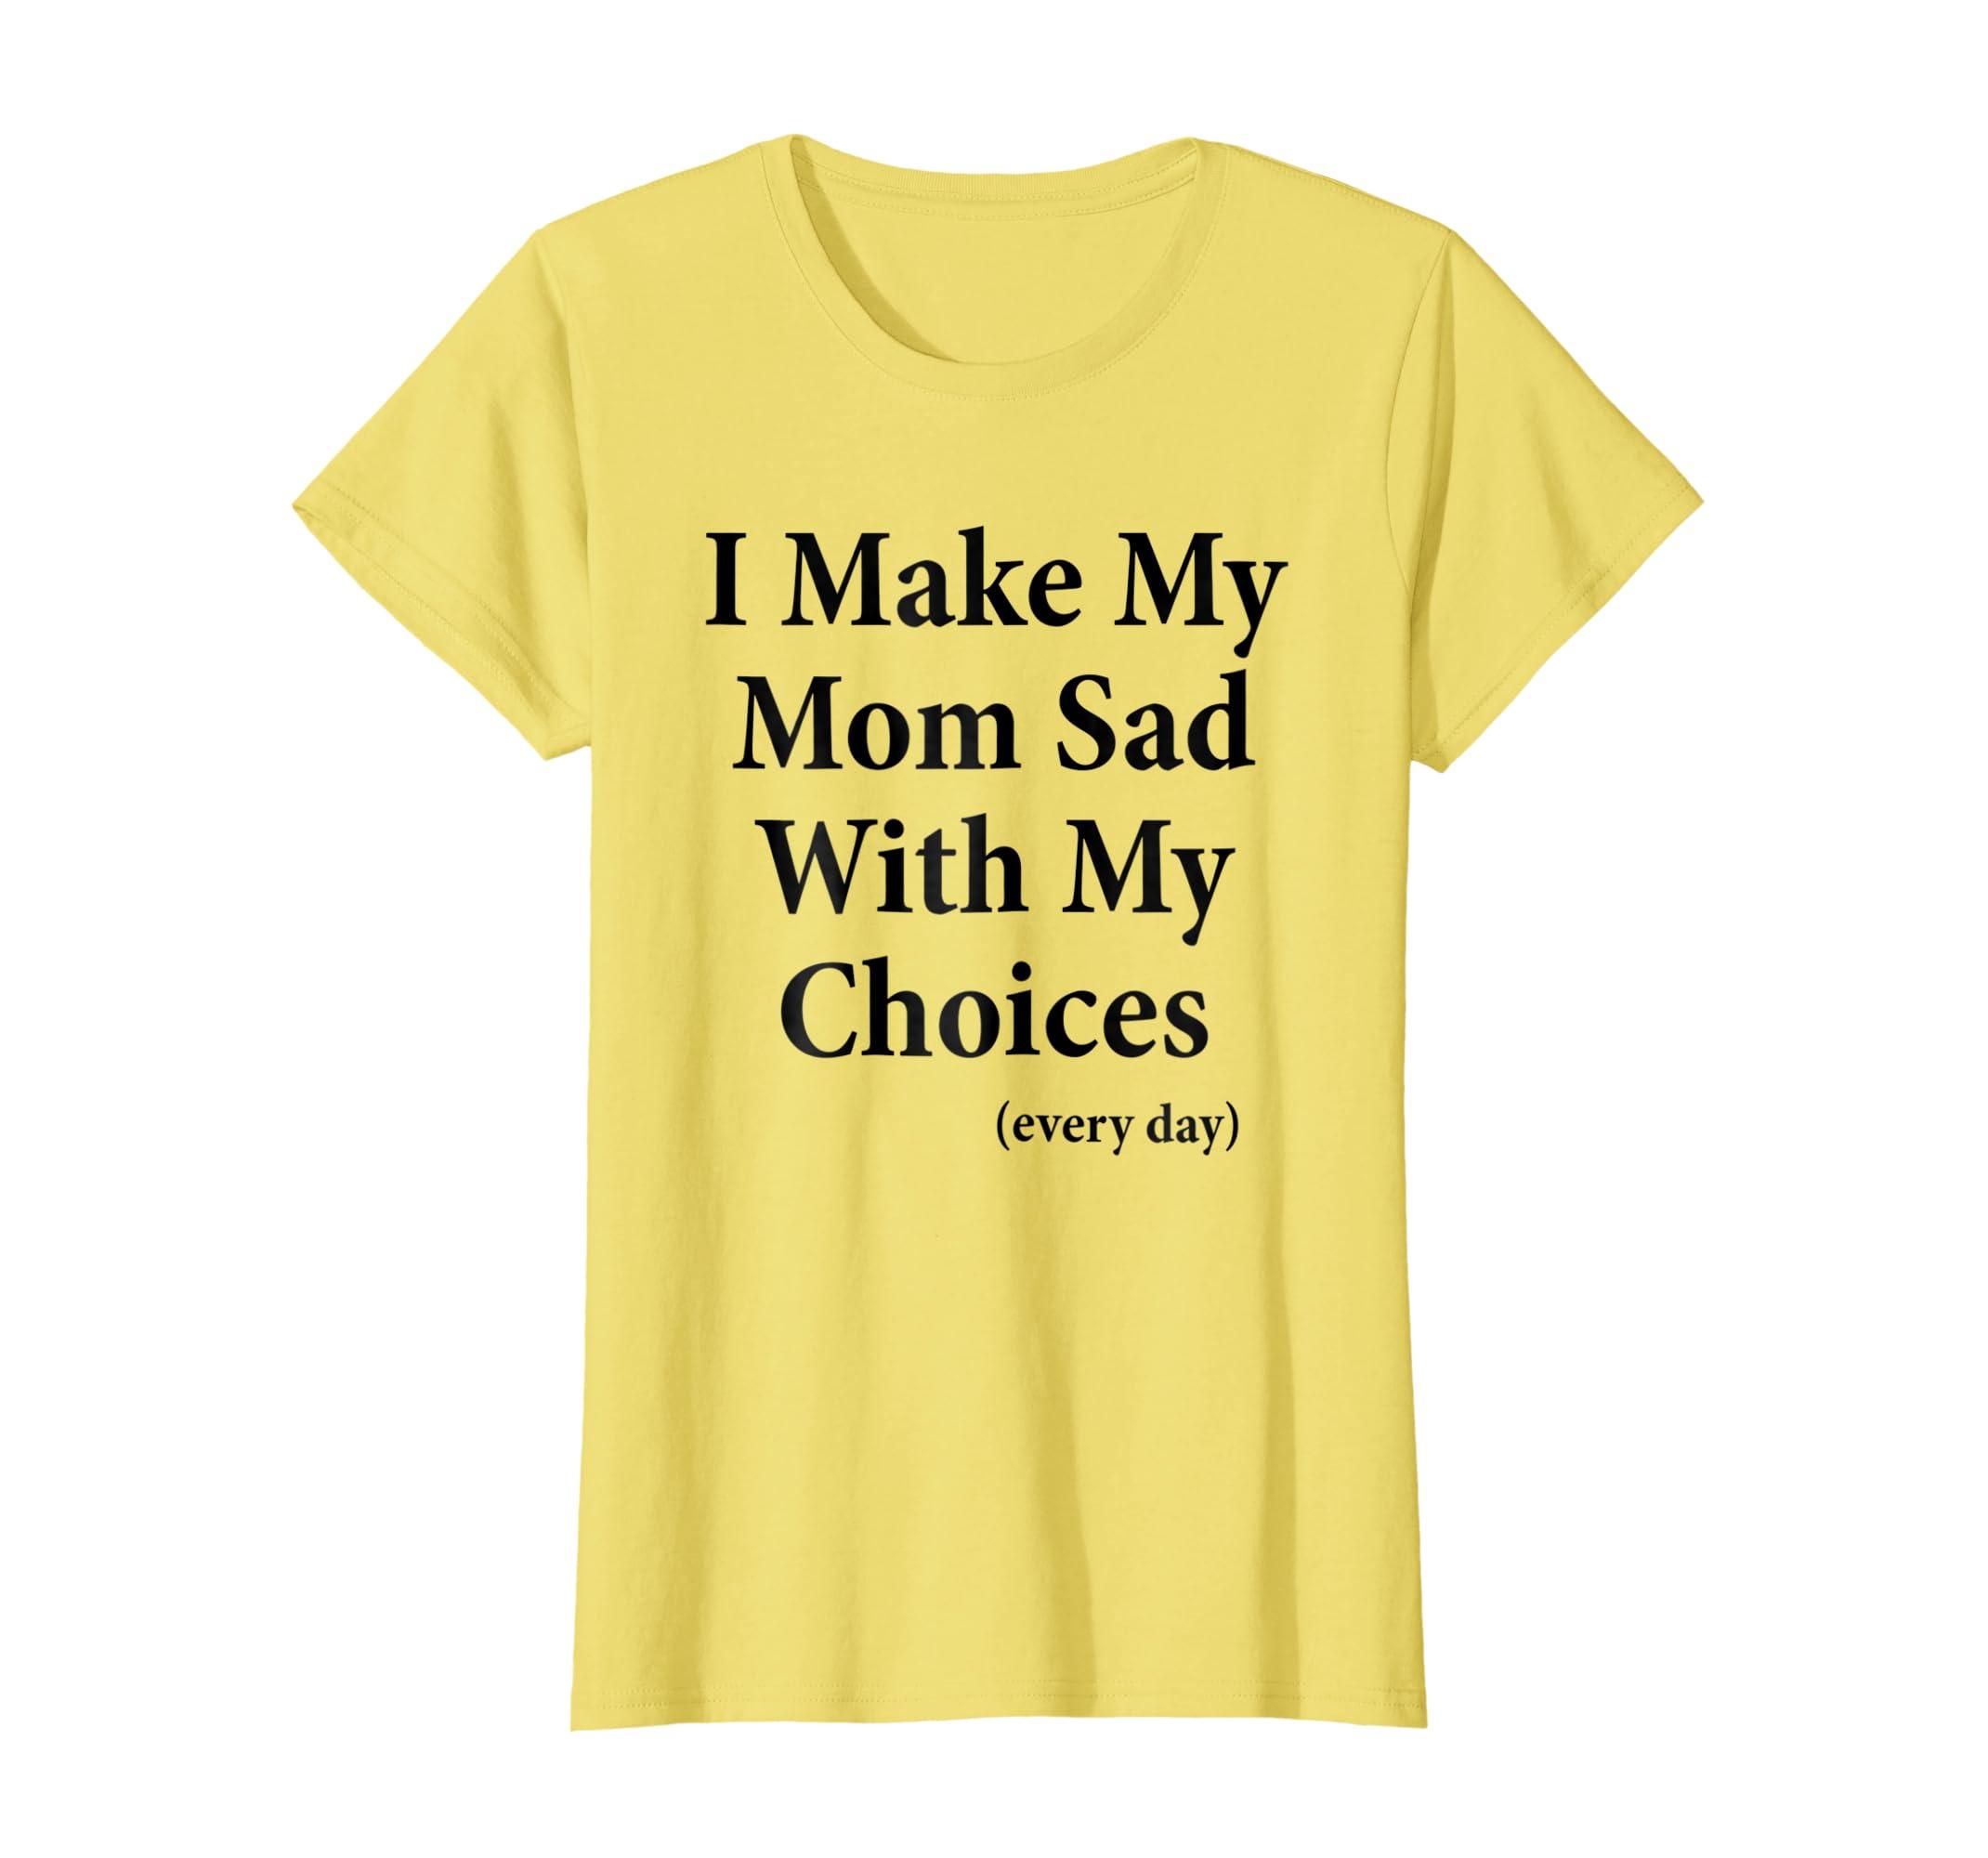 9fc98f354e25 Amazon.com: I Make My Mom Sad With My Choices Every Day T-Shirt: Clothing